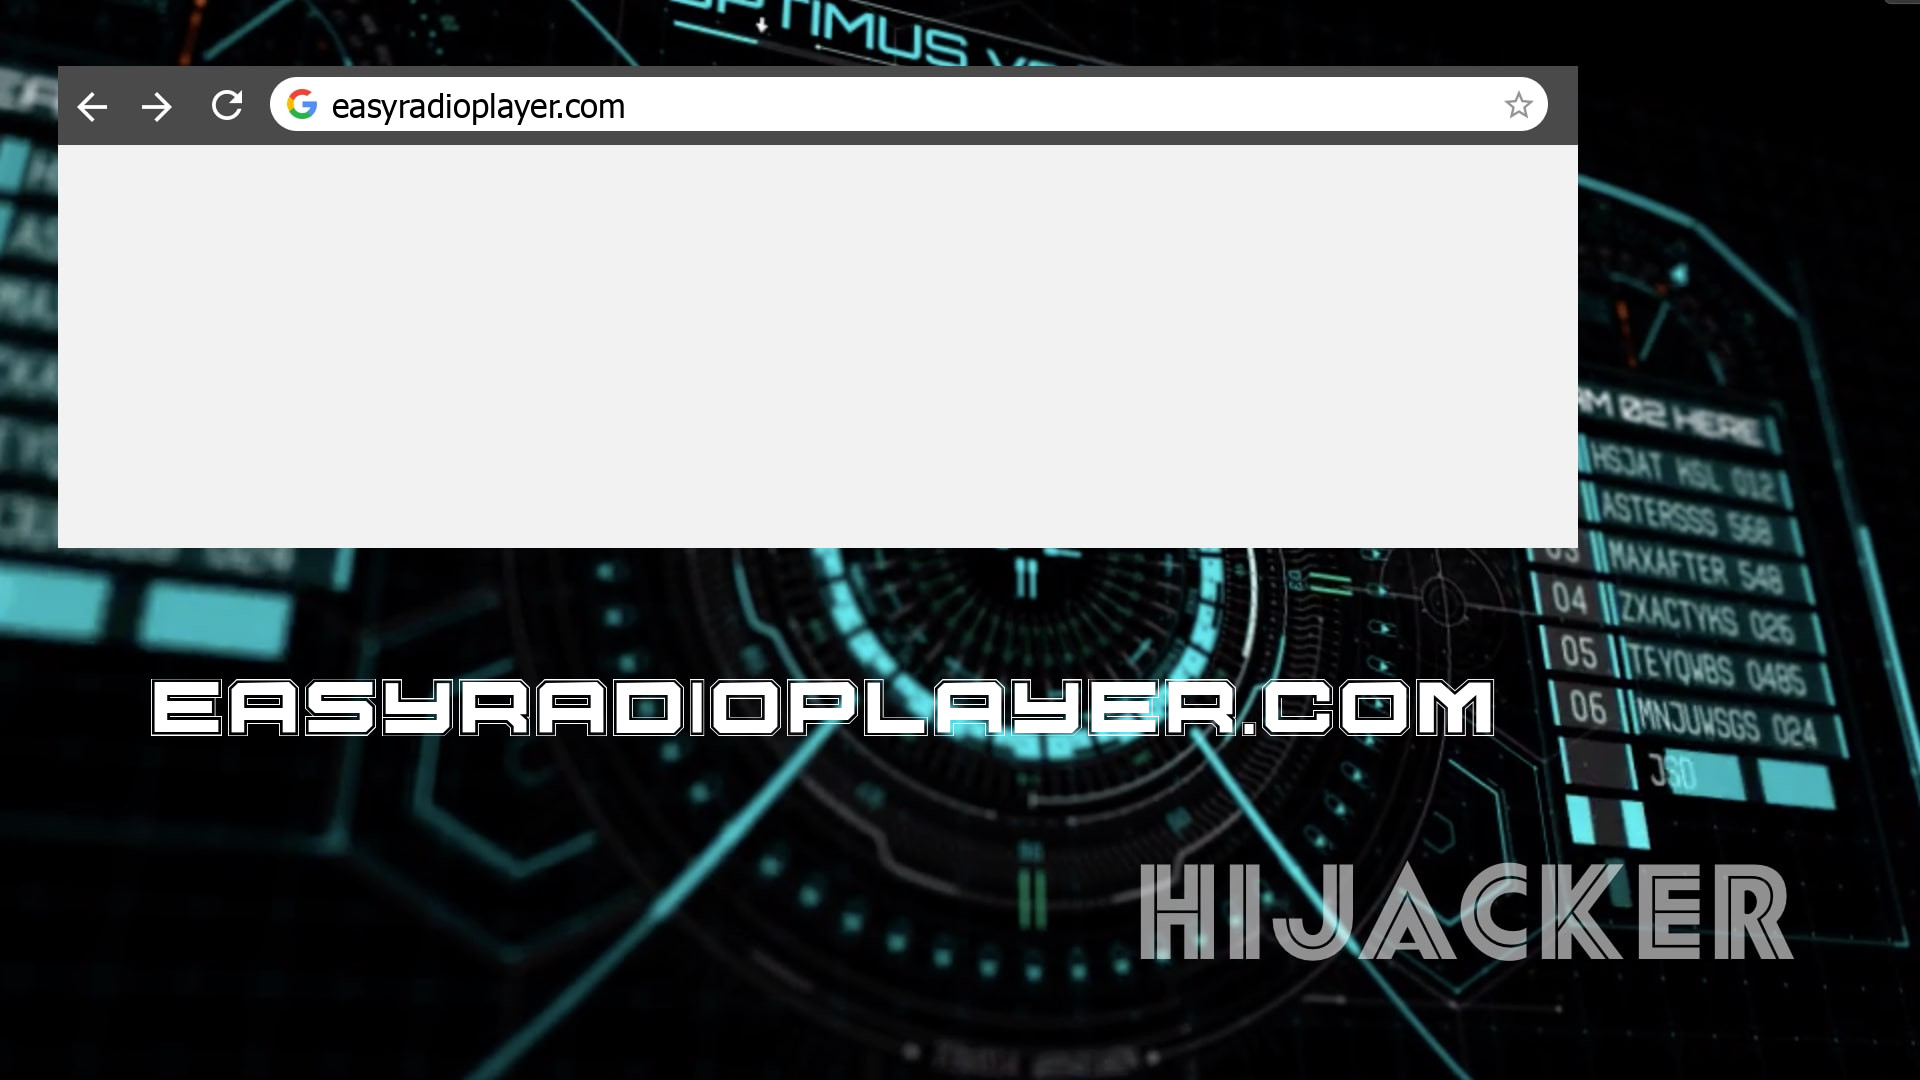 EasyRadioPlayer Hijacker